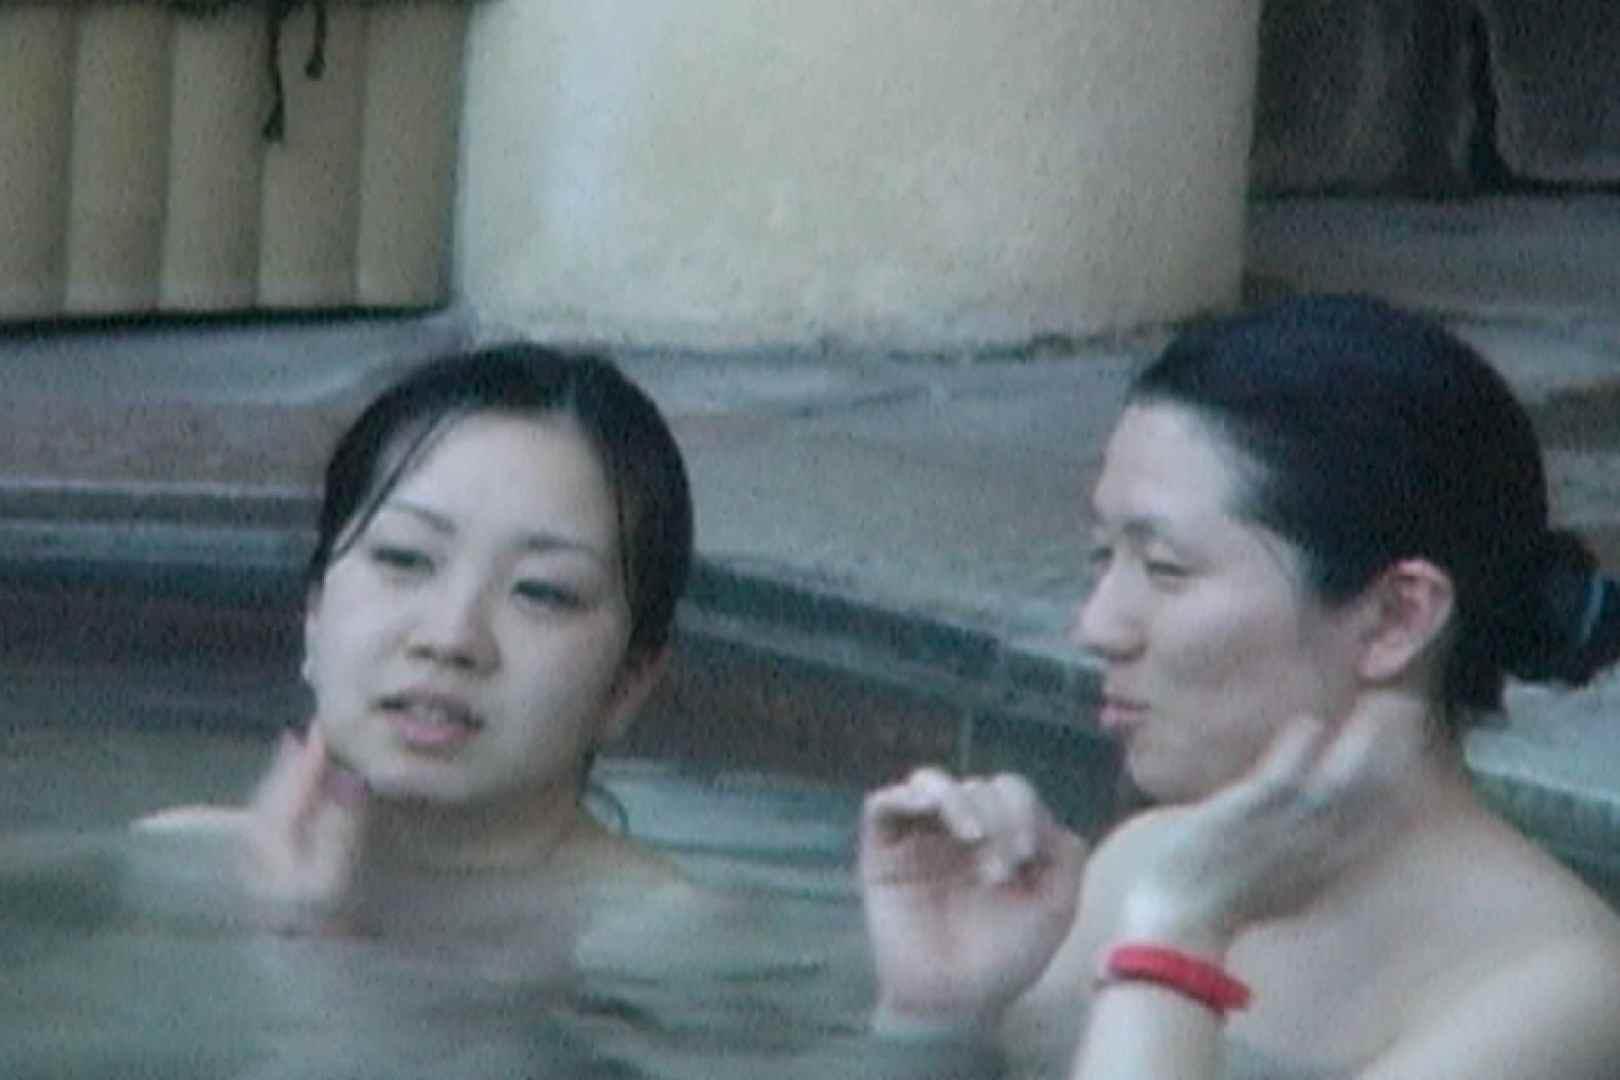 Aquaな露天風呂Vol.598 露天   OLセックス  79画像 4